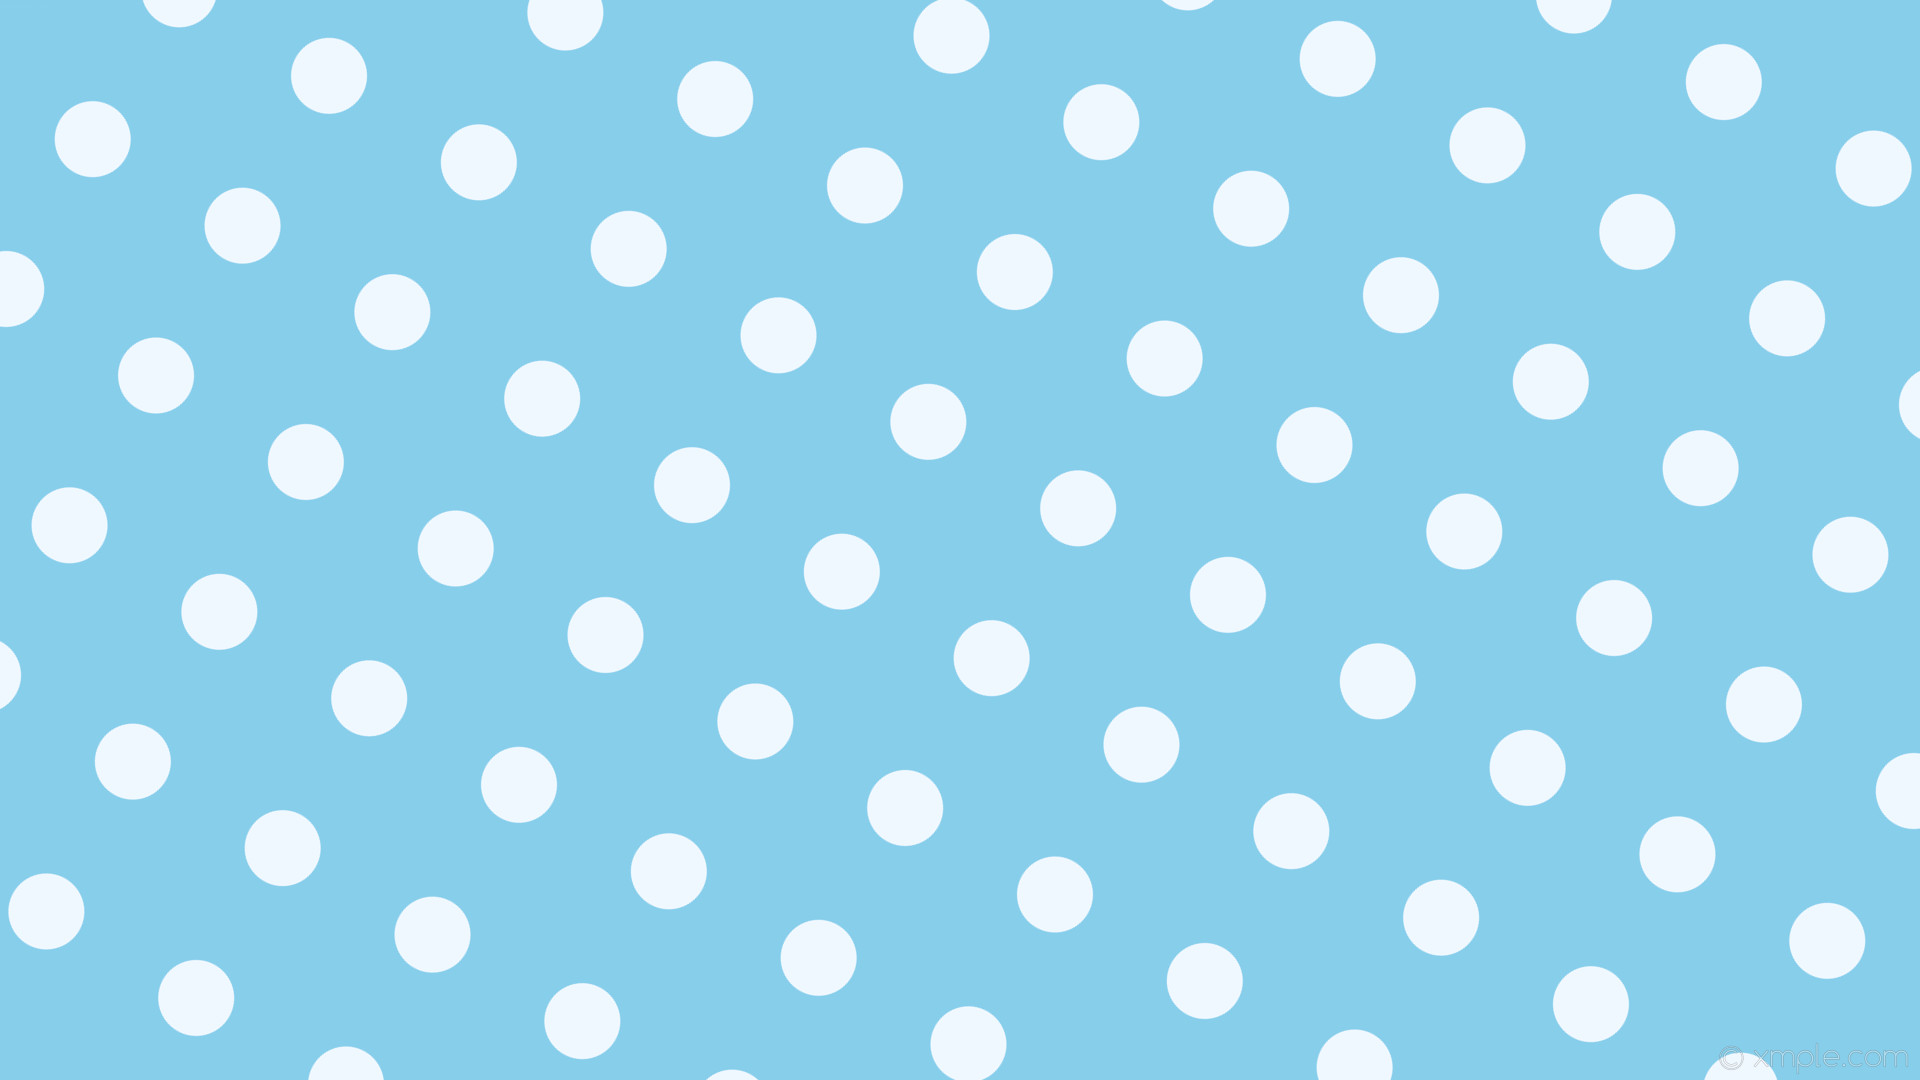 wallpaper dots spots white blue polka sky blue alice blue #87ceeb #f0f8ff  150°